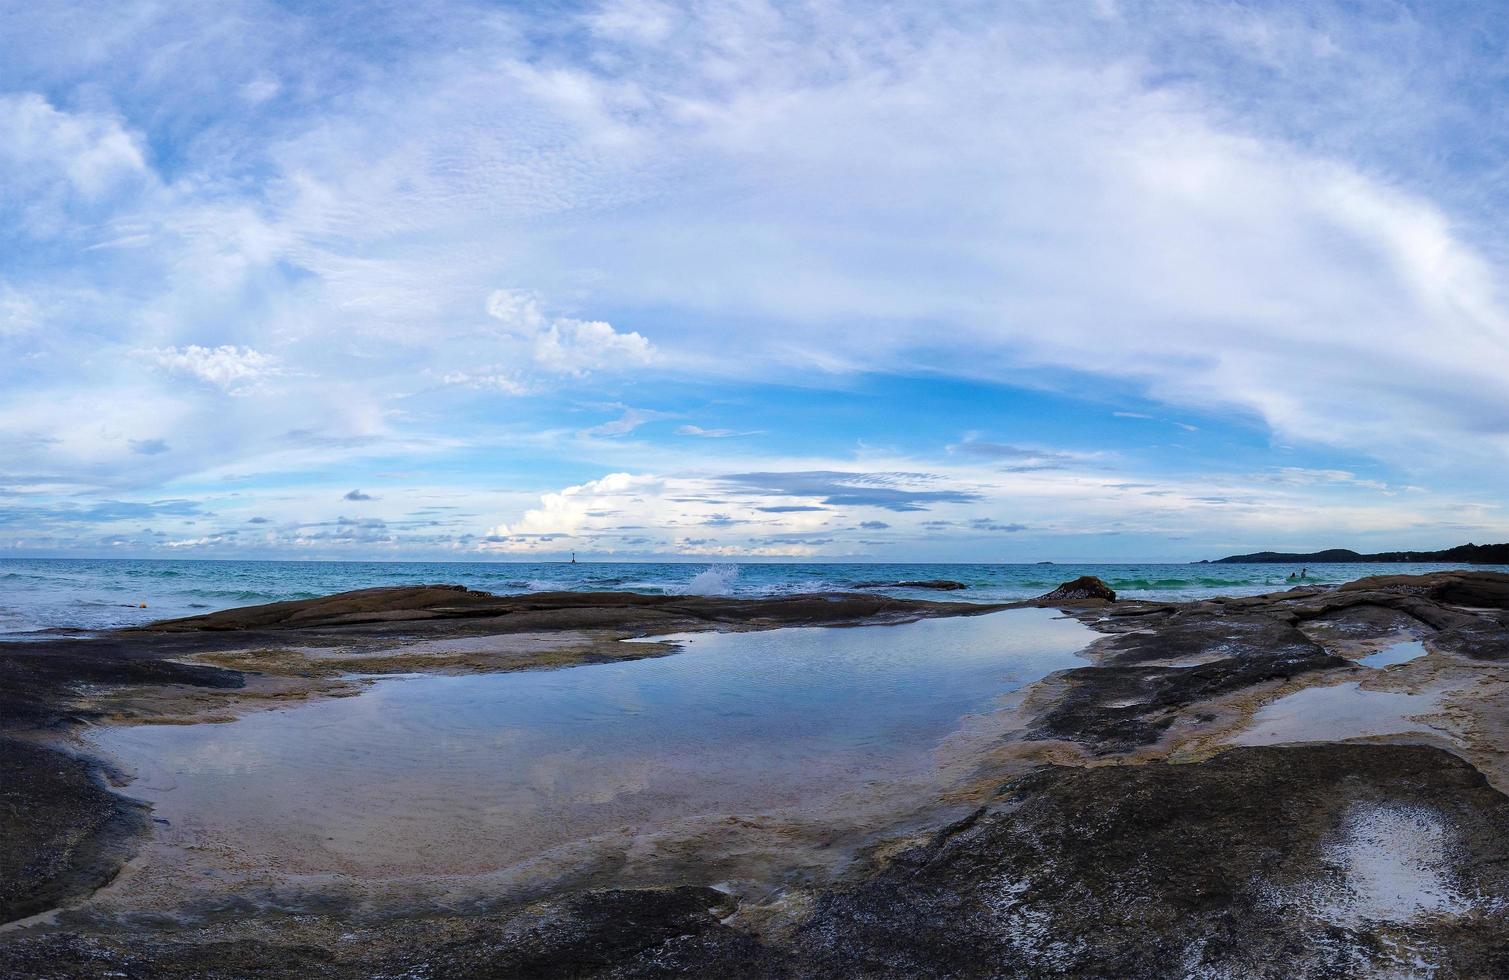 Panorama der felsigen Küste foto